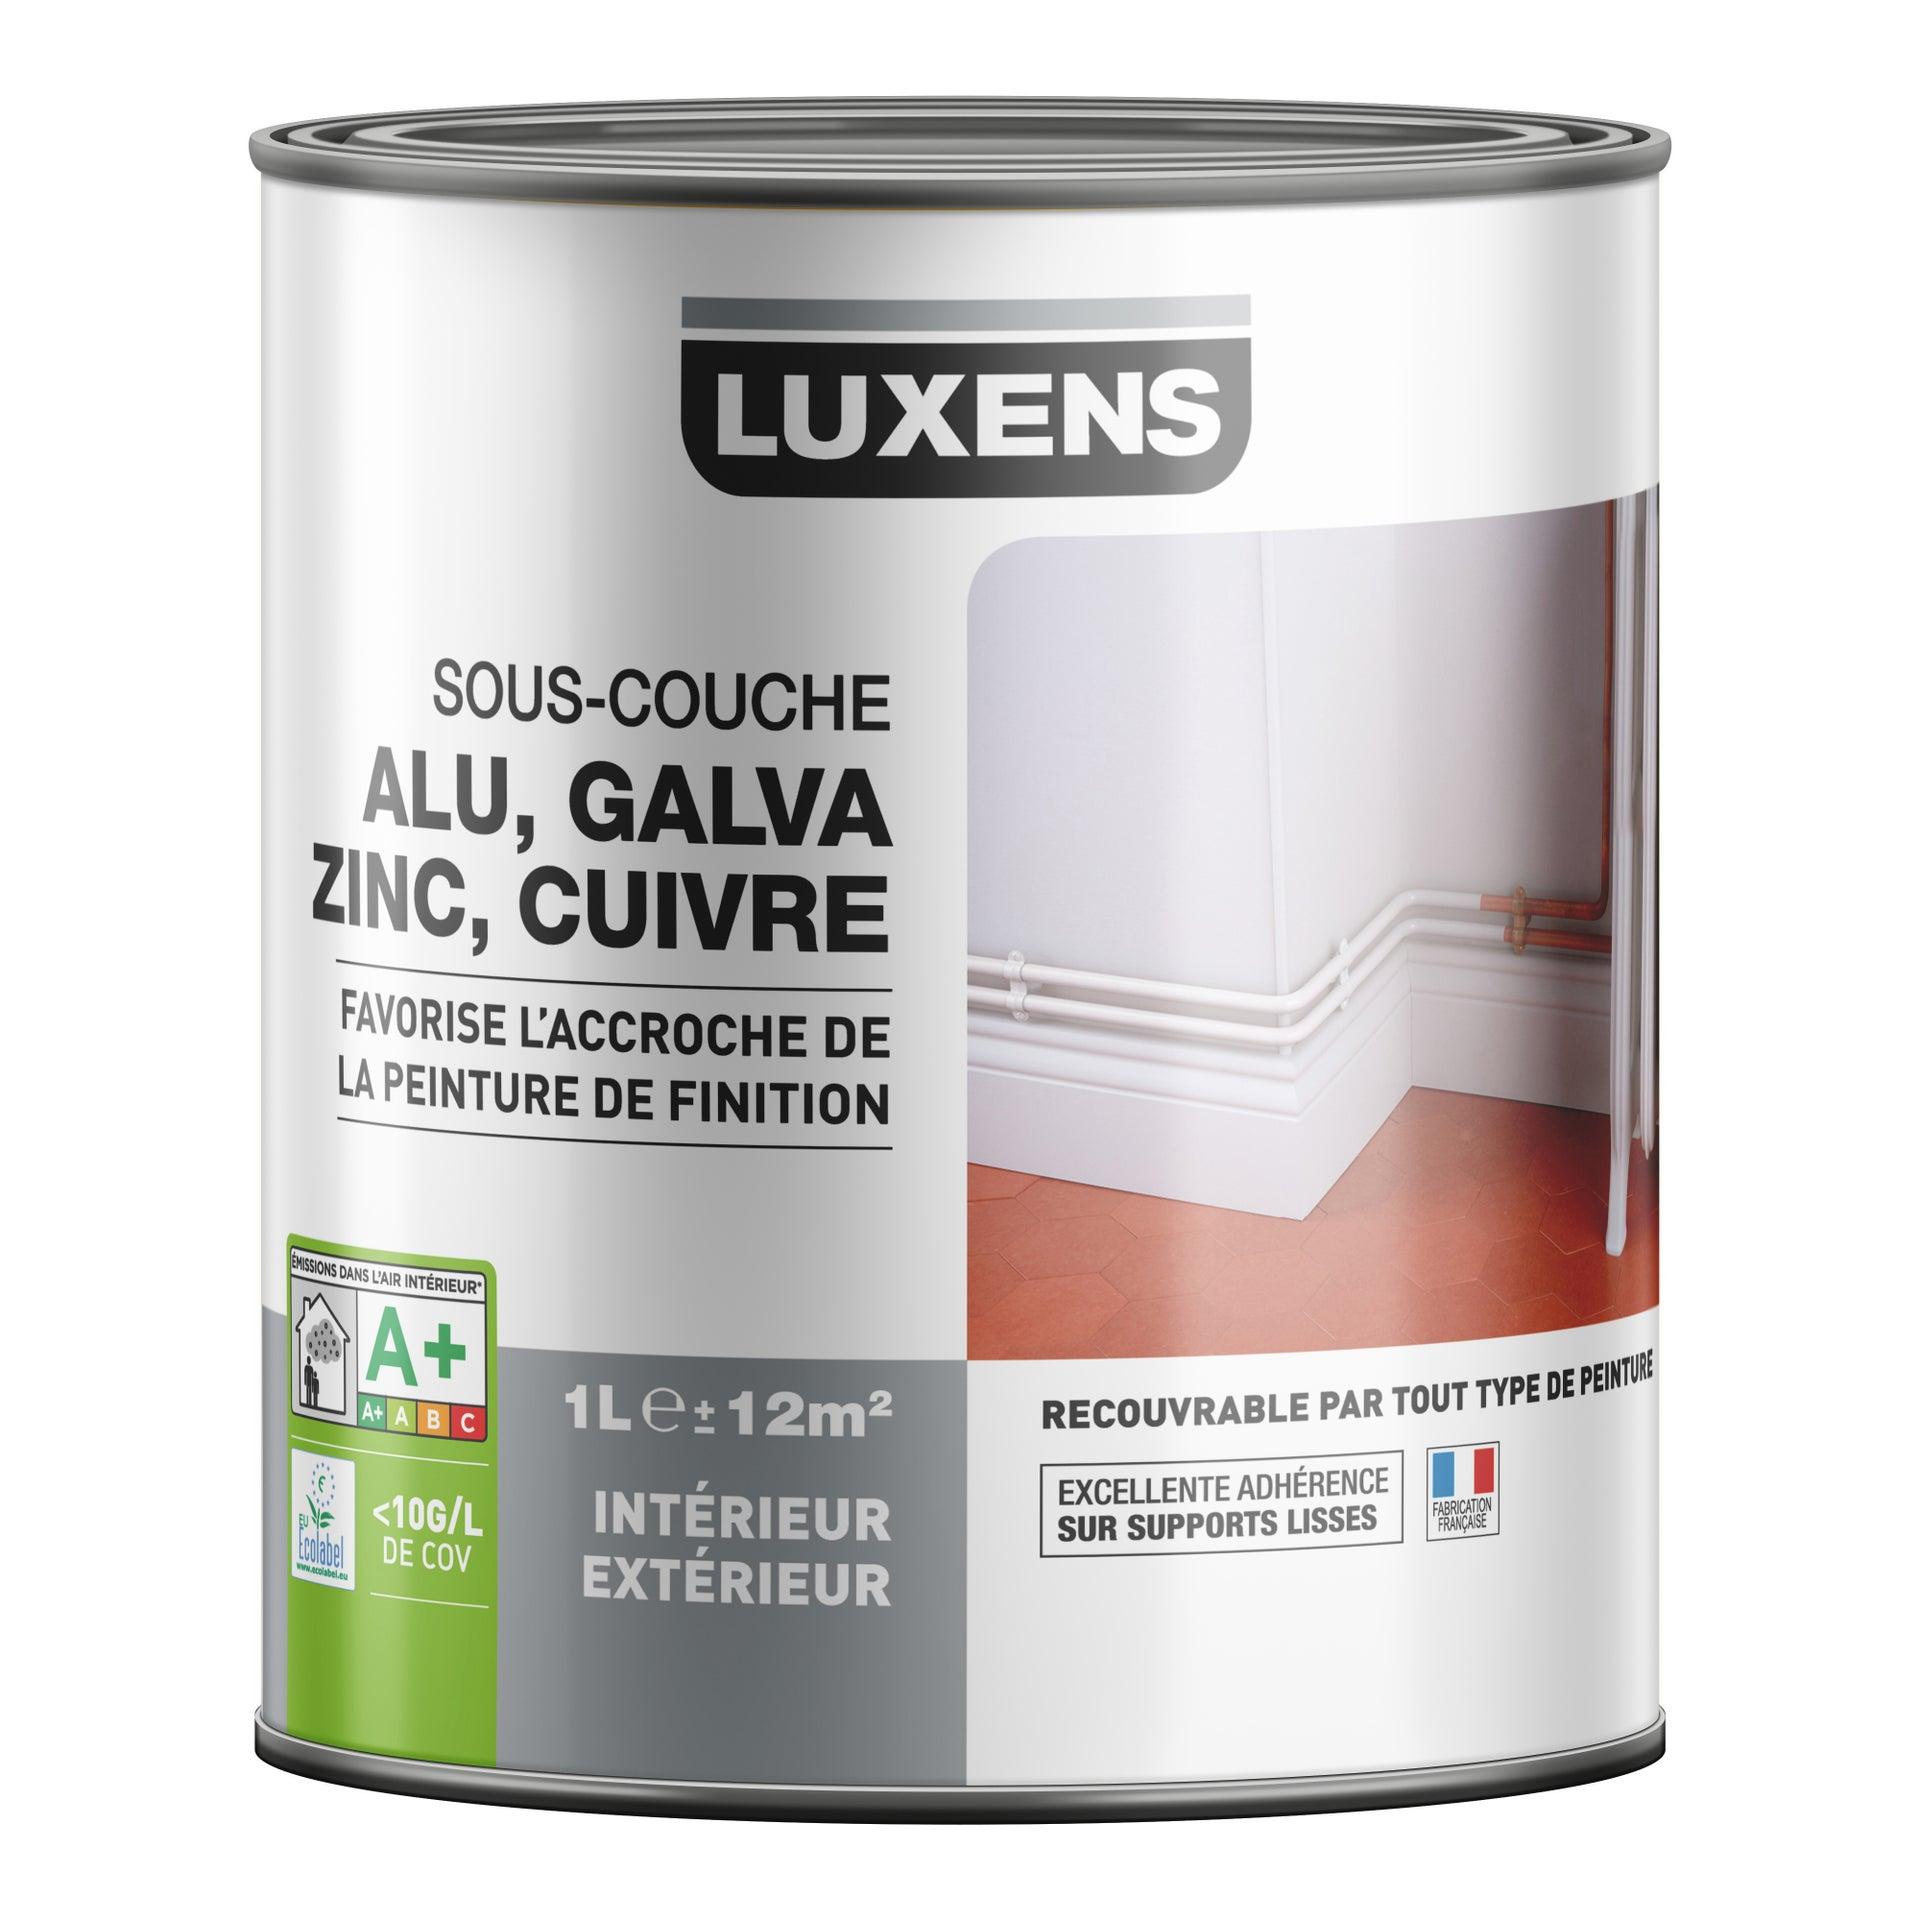 souscouche pvc aluminium galva luxens 1 l  leroy merlin